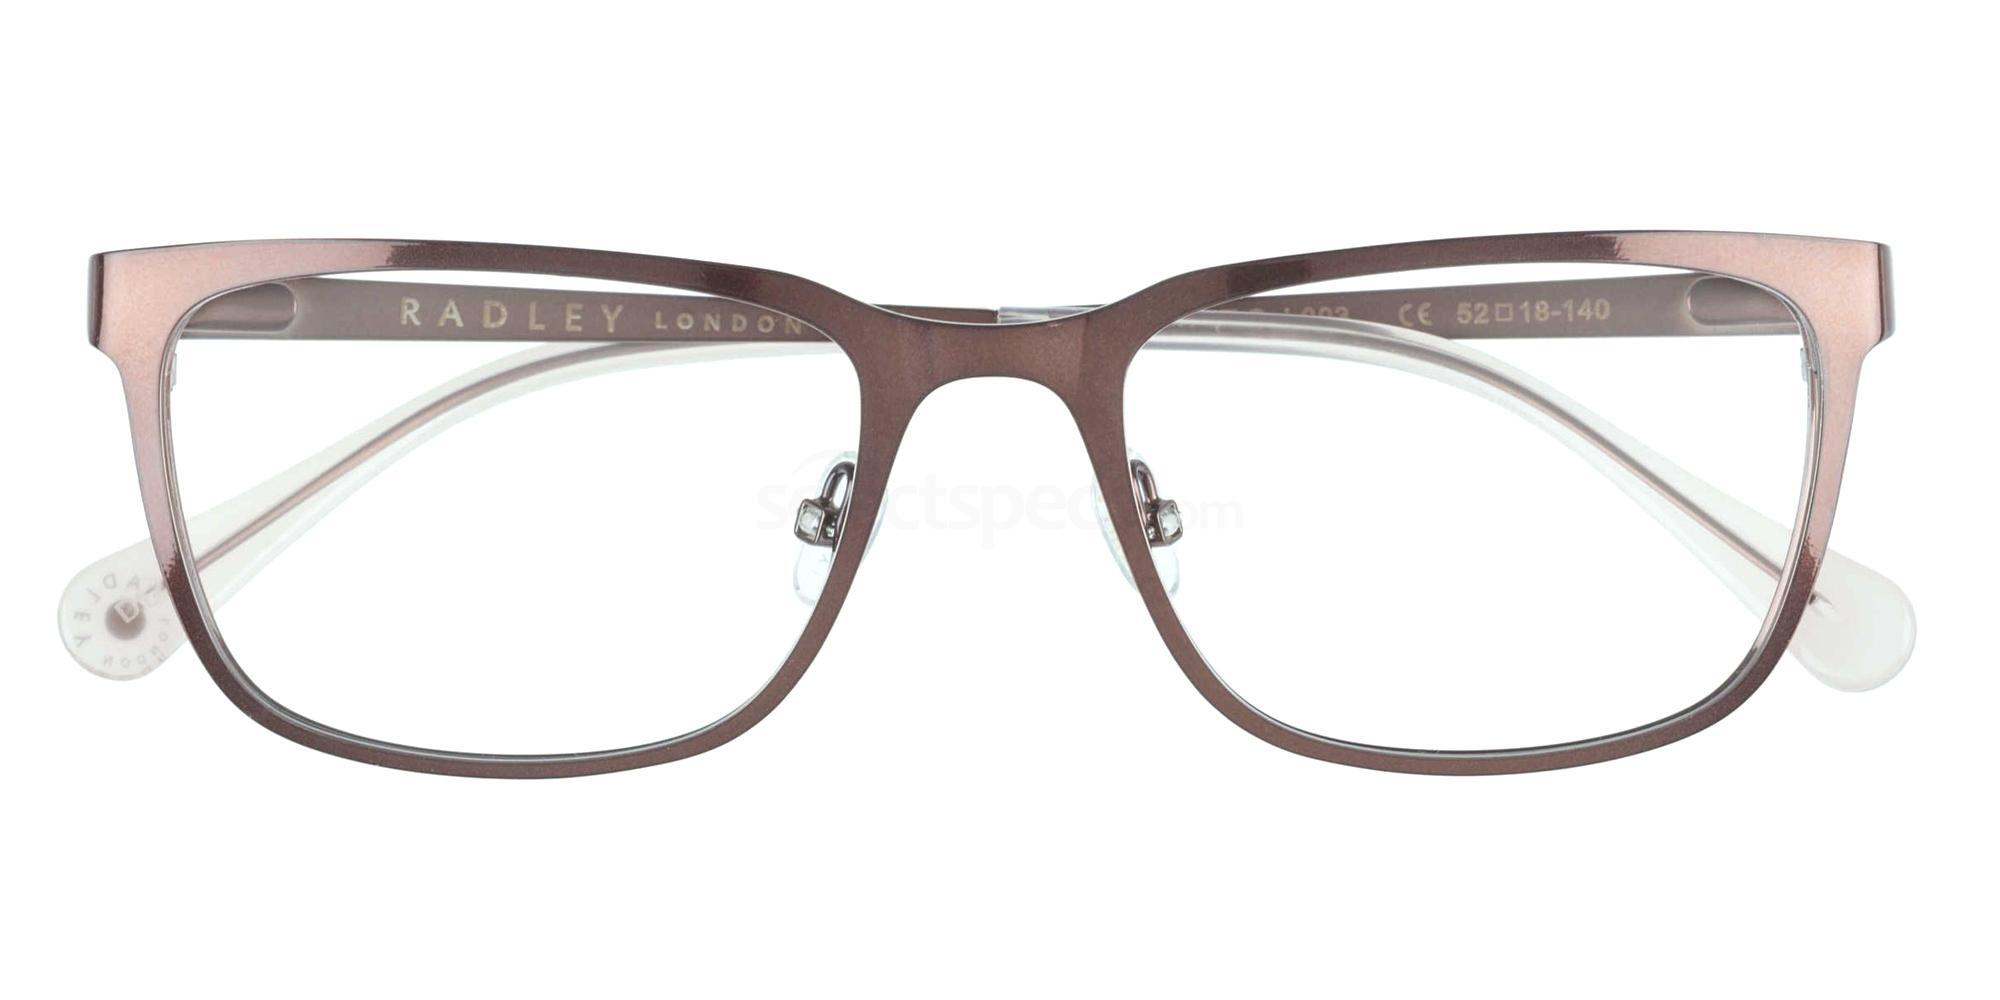 003 RDO-LEONIE Glasses, Radley London